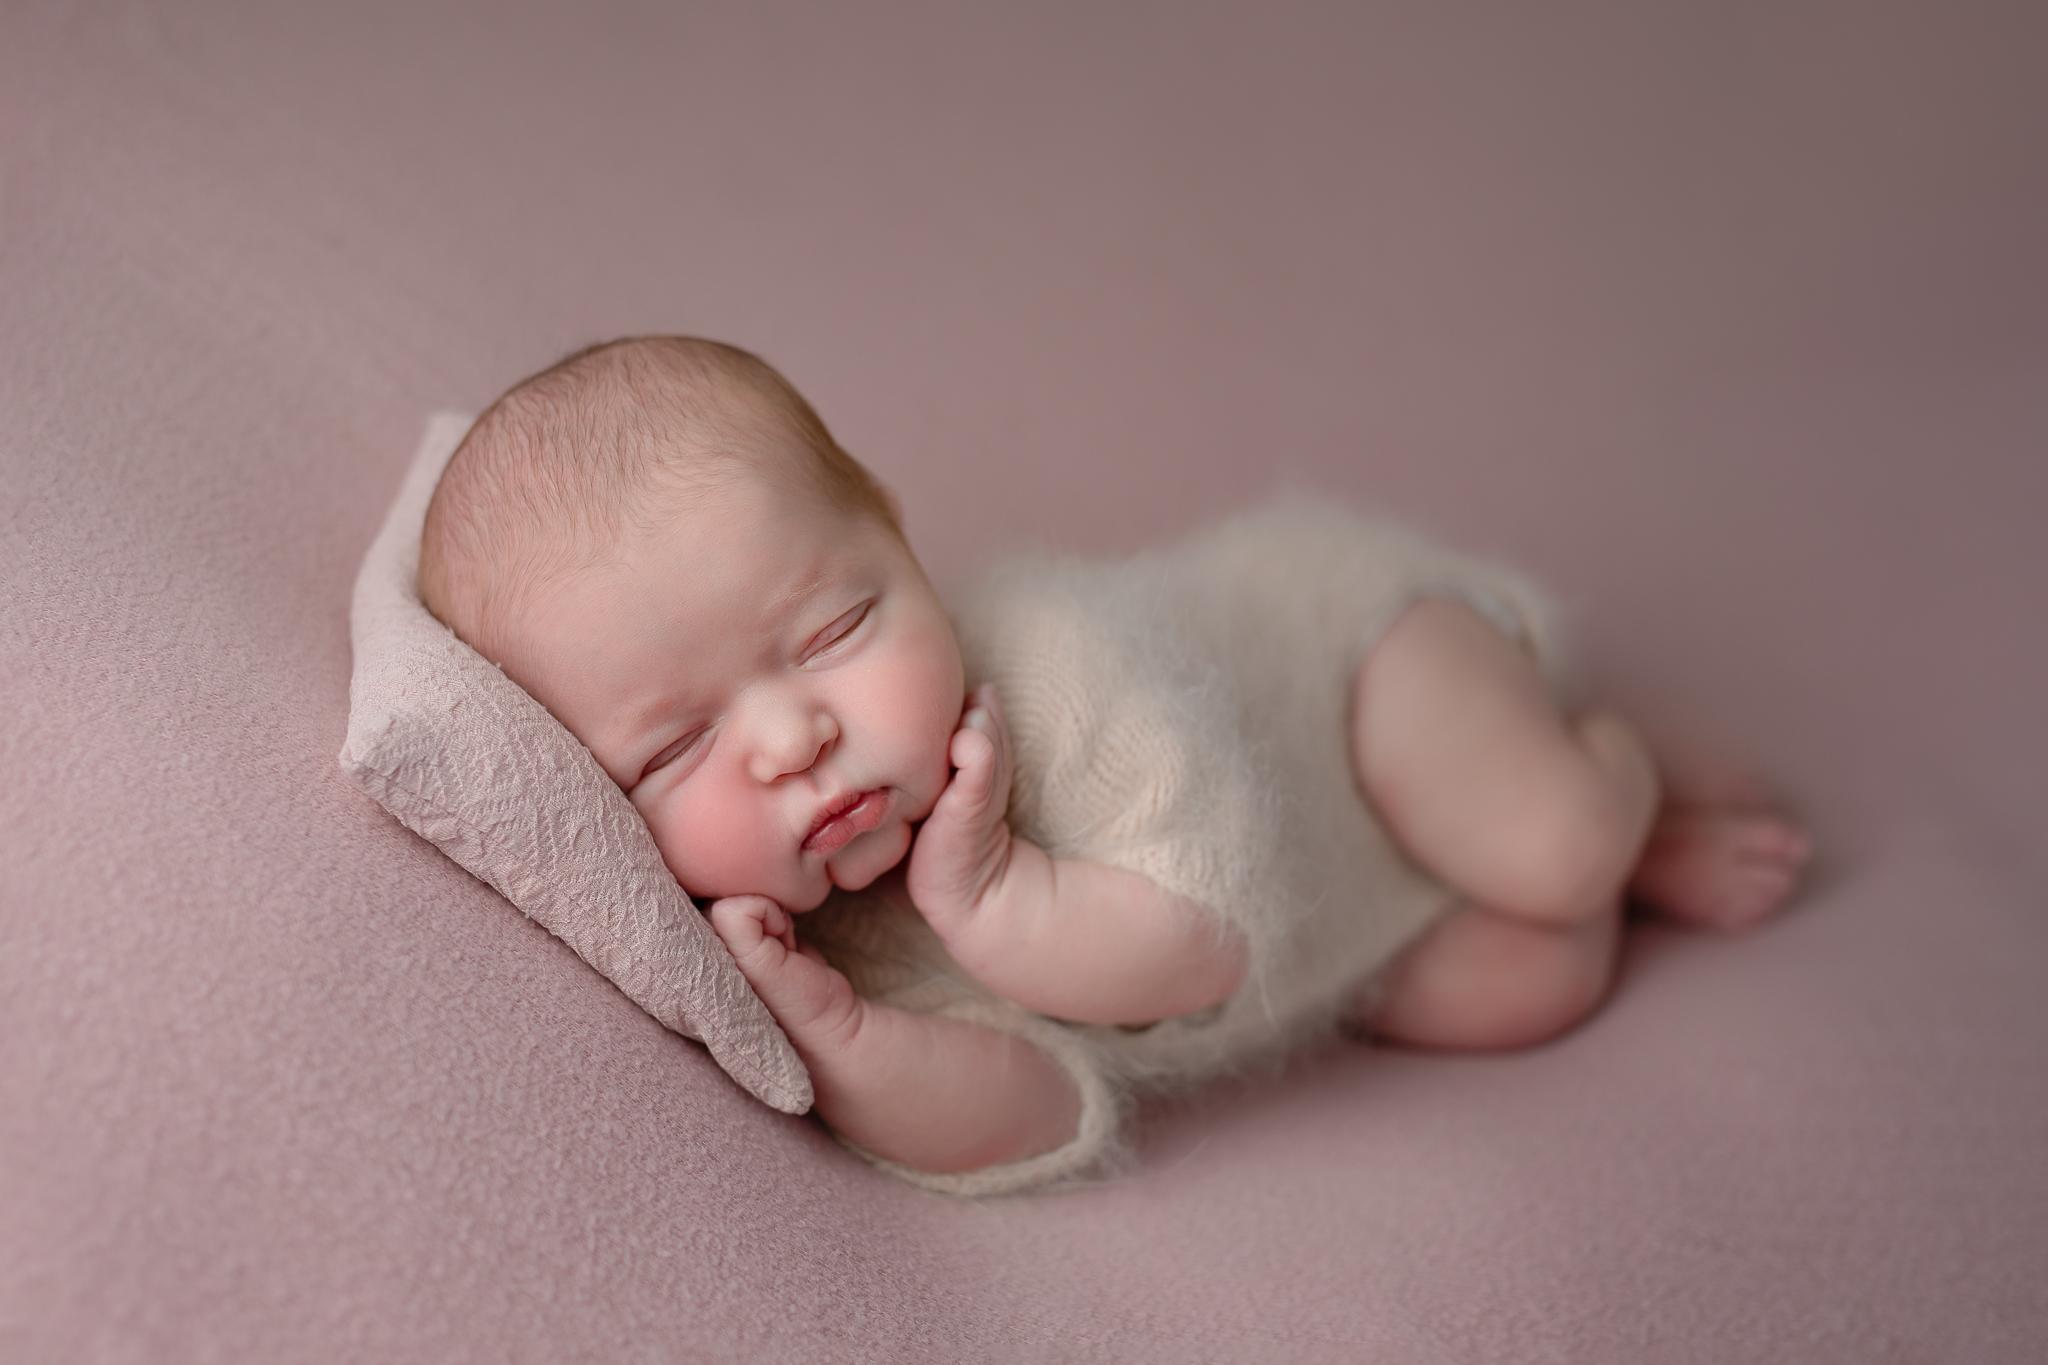 Newborn529NaomiLuciennePhotography032019-Edit.jpg